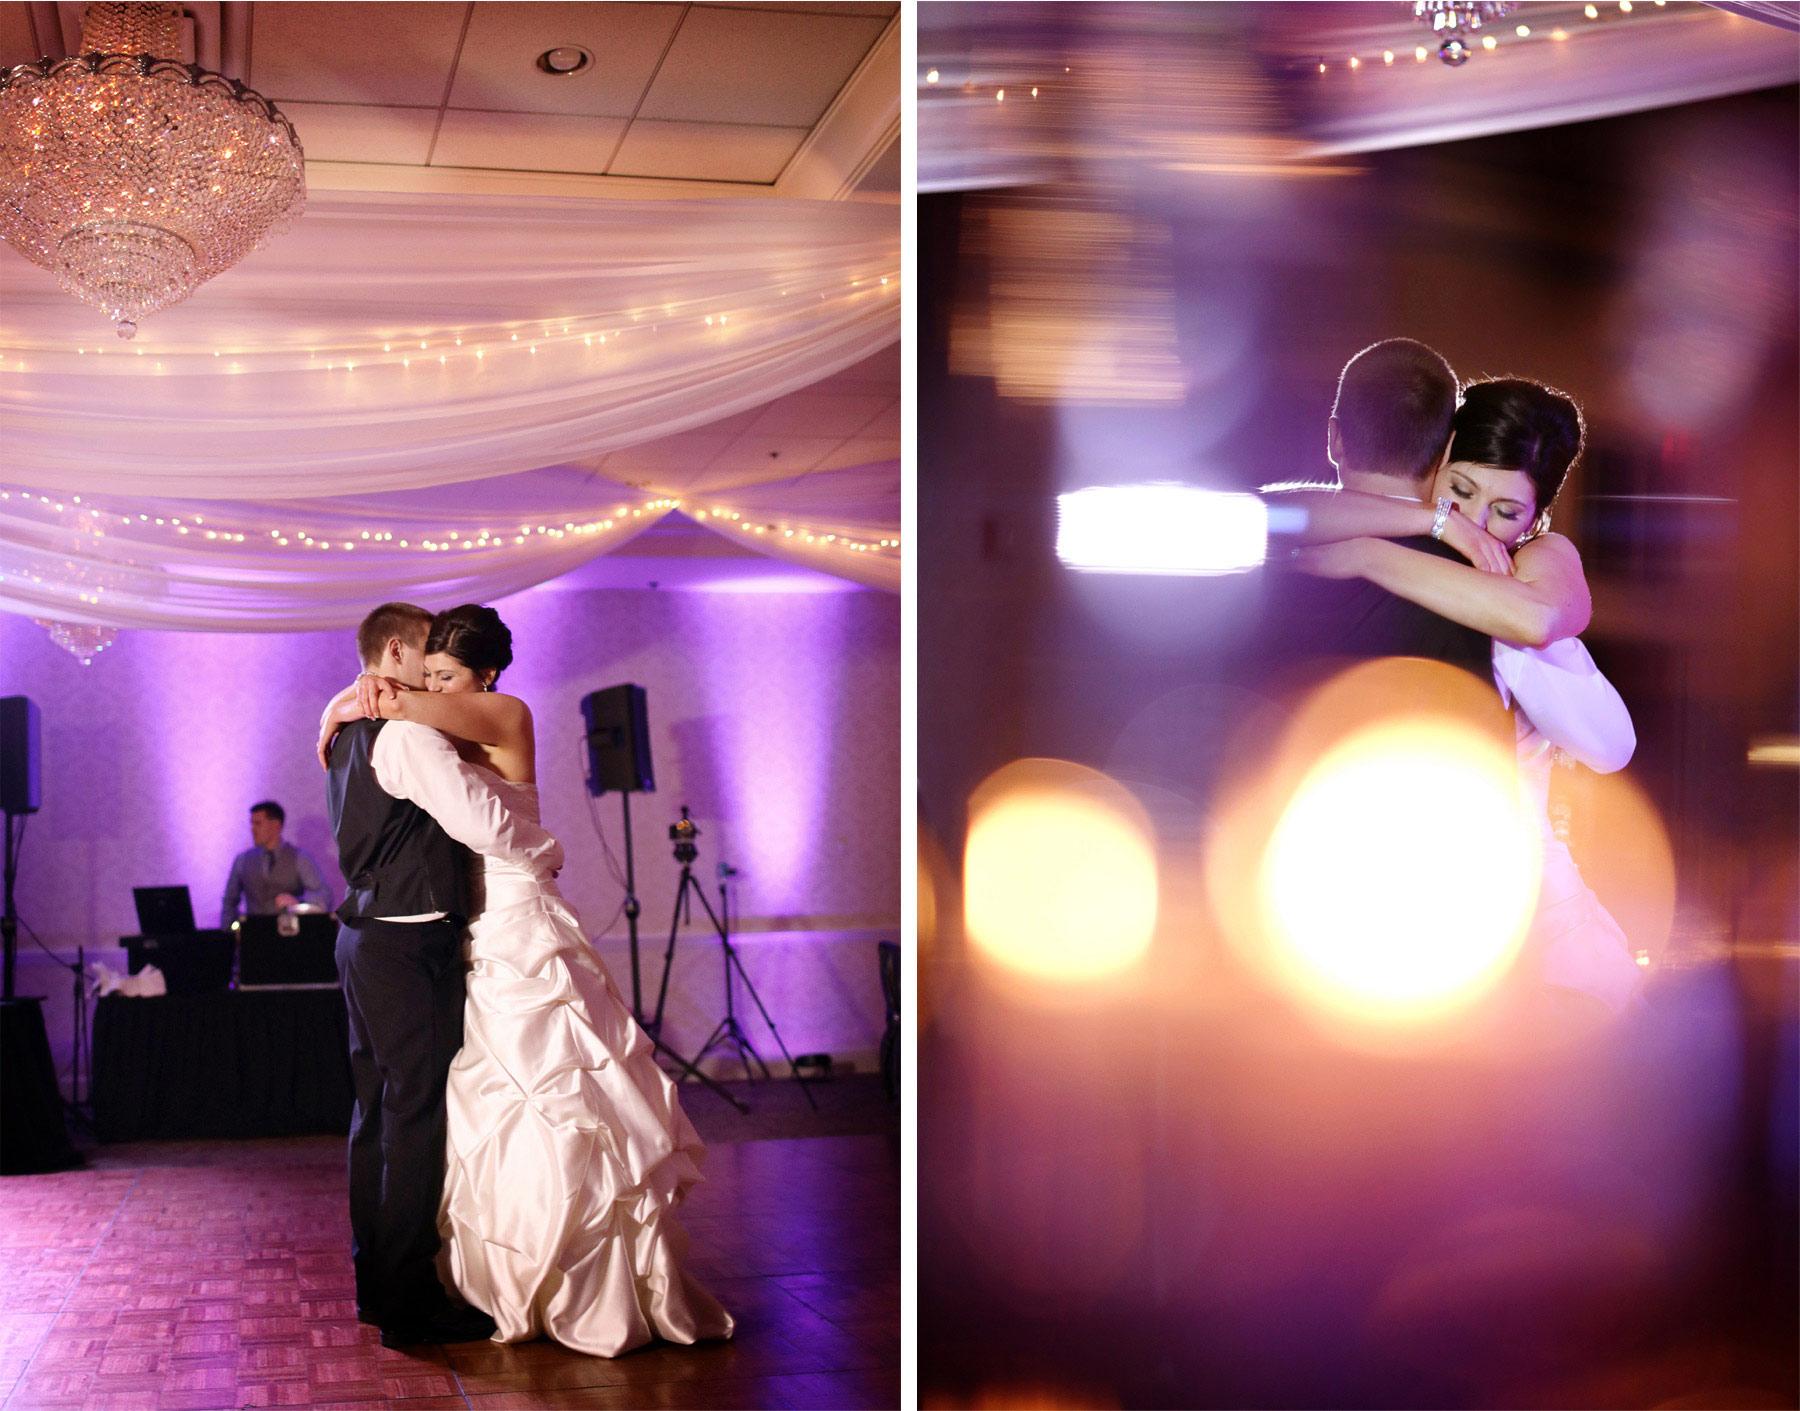 27-Eden-Prairie-Minnesota-Wedding-Photographer-by-Andrew-Vick-Photography-Fall-Autumn-Bearpath-Golf-Country-Club-Reception-Bride-Groom-Dance-Brittany-and-Ryan.jpg